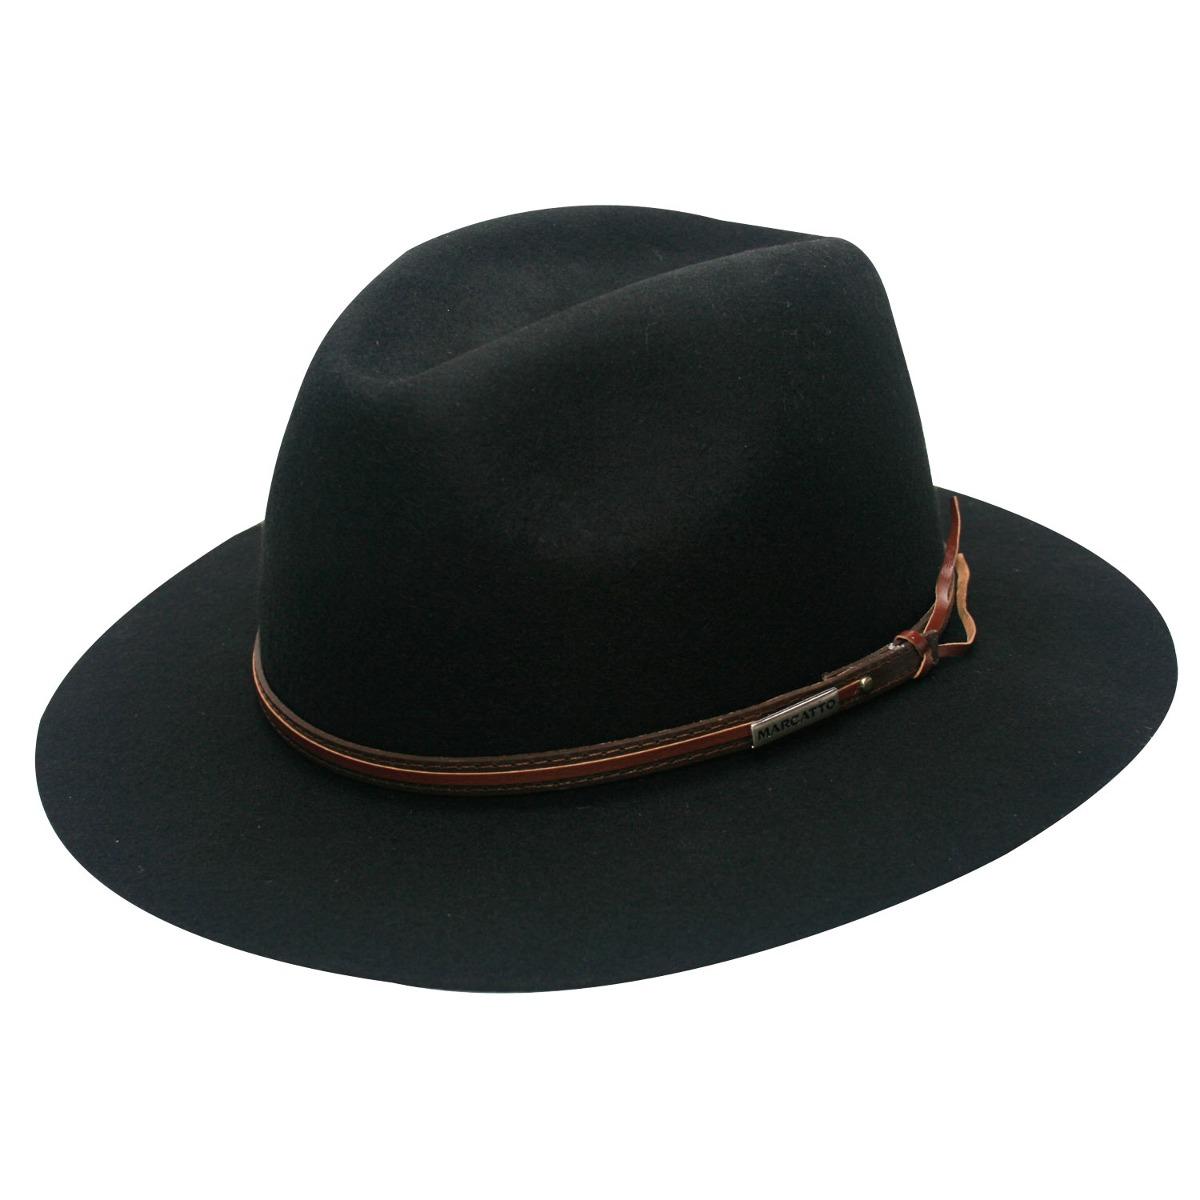 chapéu de feltro preto outback explorer marcatto-tamanho 57. Carregando zoom . 7bf3dd76086